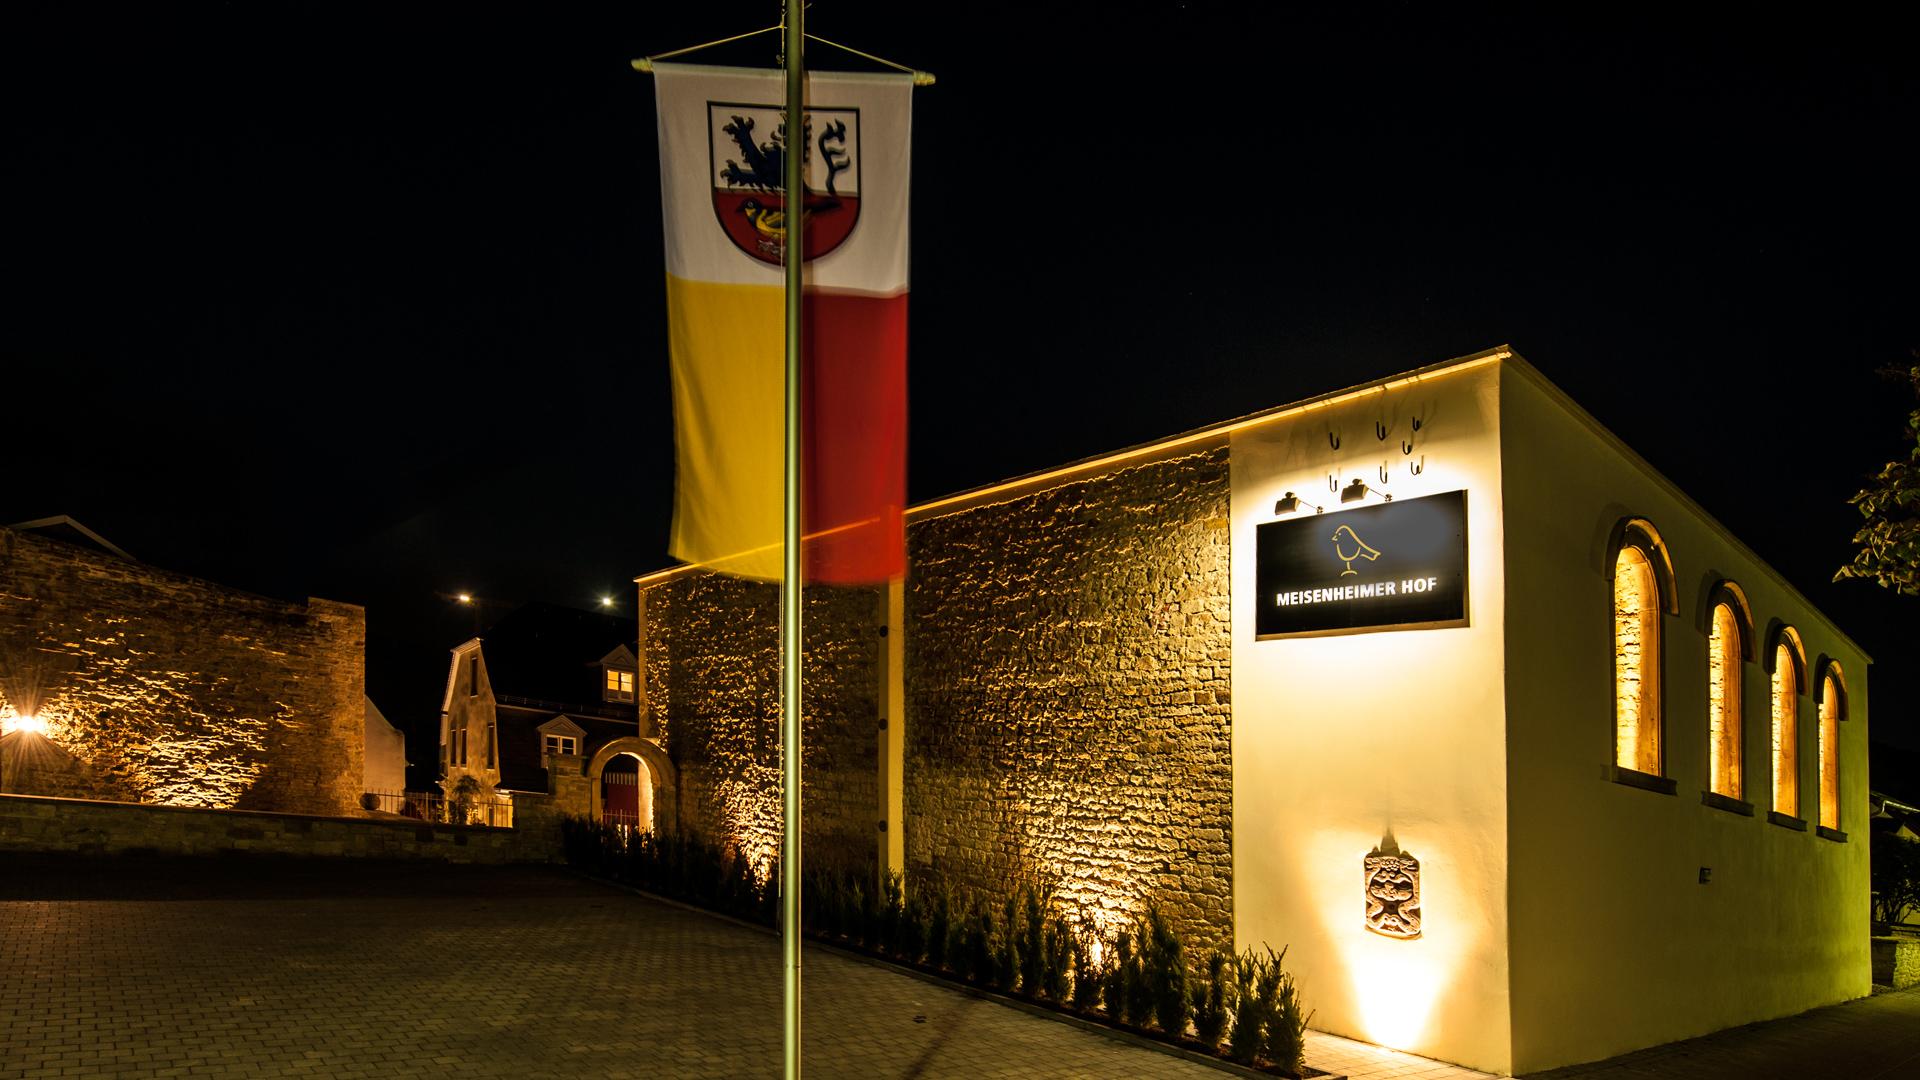 Meisenheimer Hof in Meisenheim